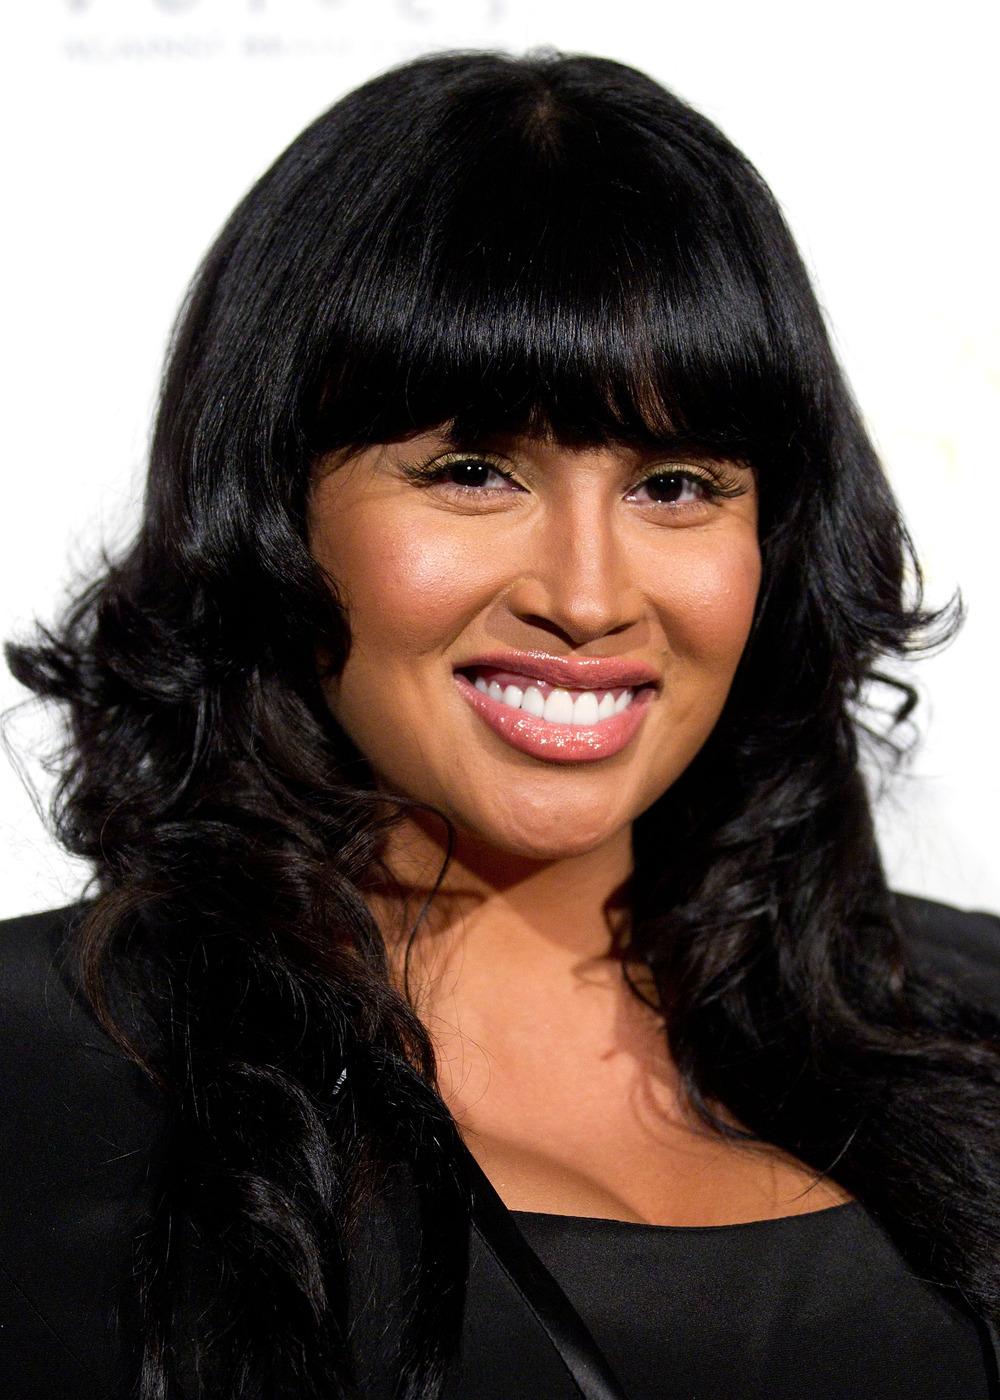 Love Amp Hip Hop Star Somaya Reece S Transformation See